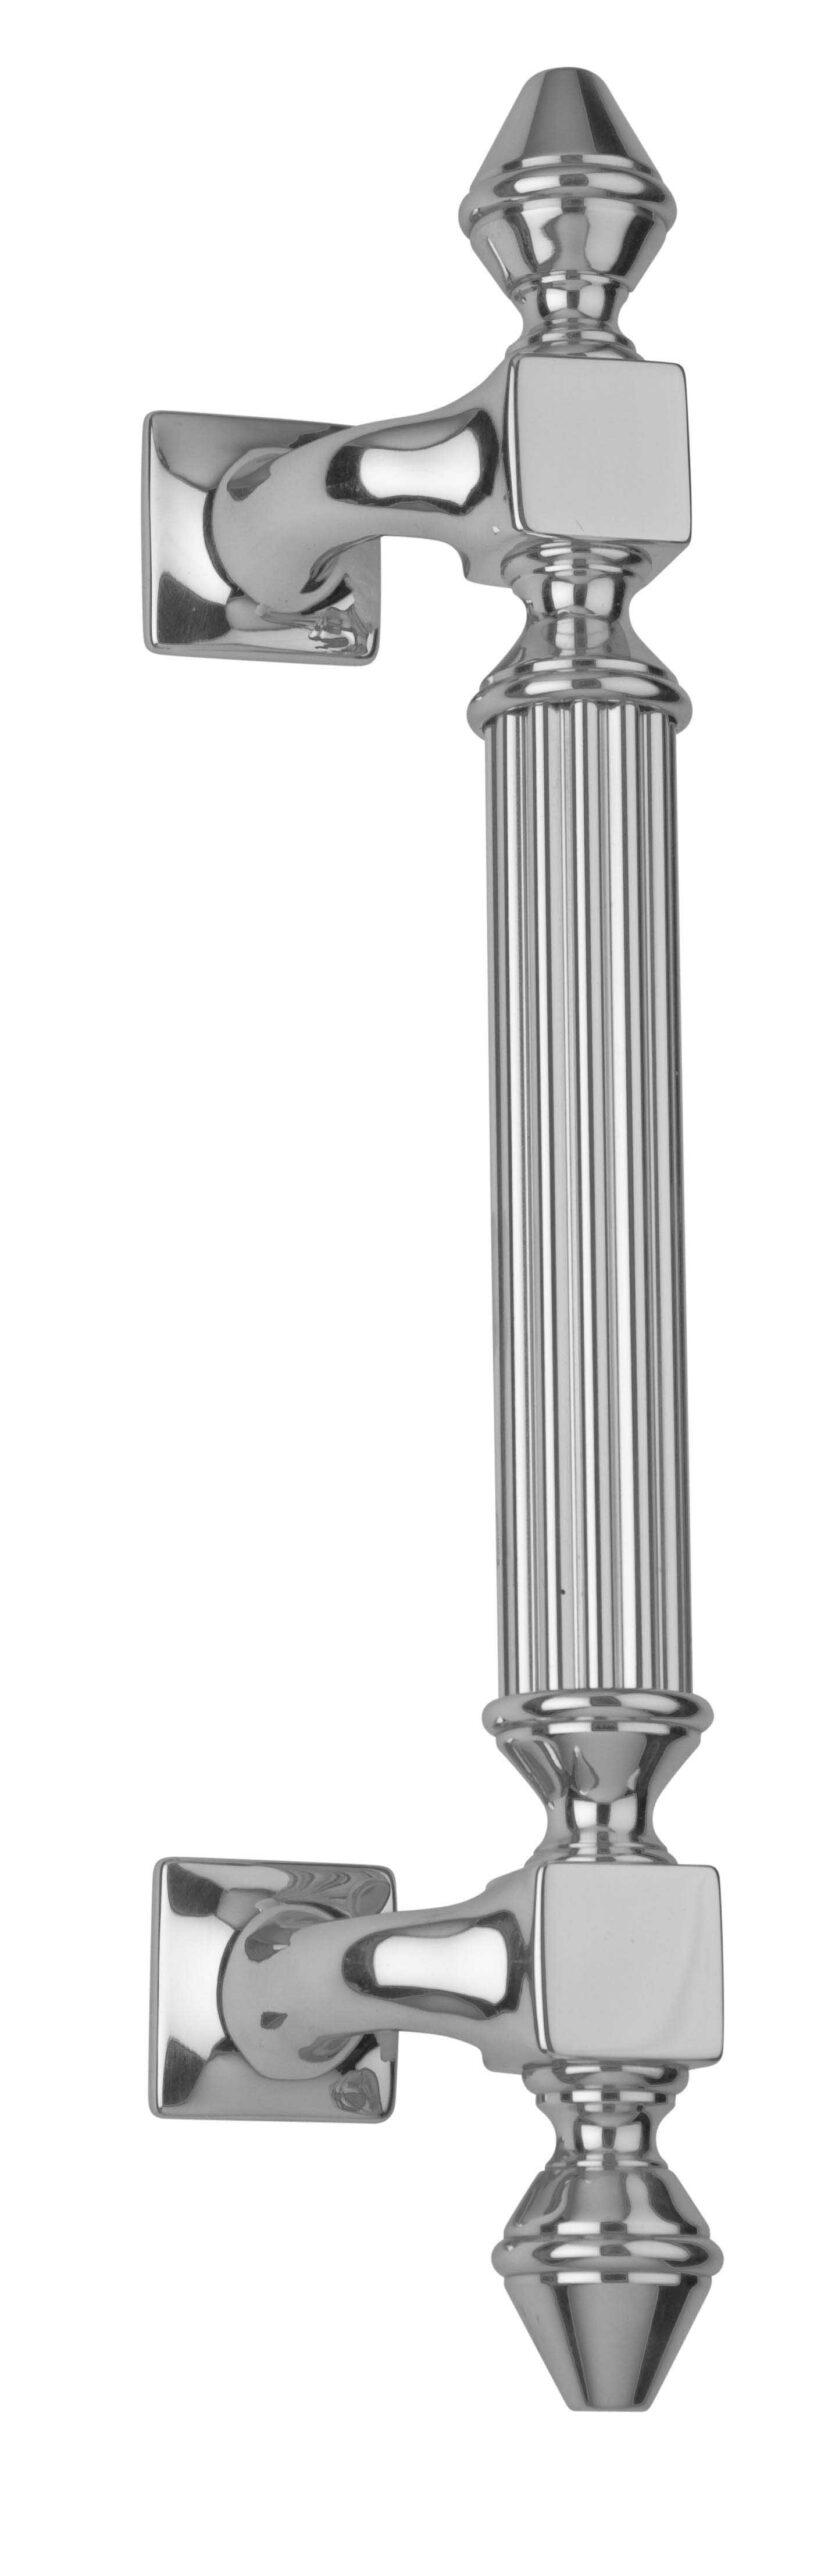 Maniglione Impero – PUH026